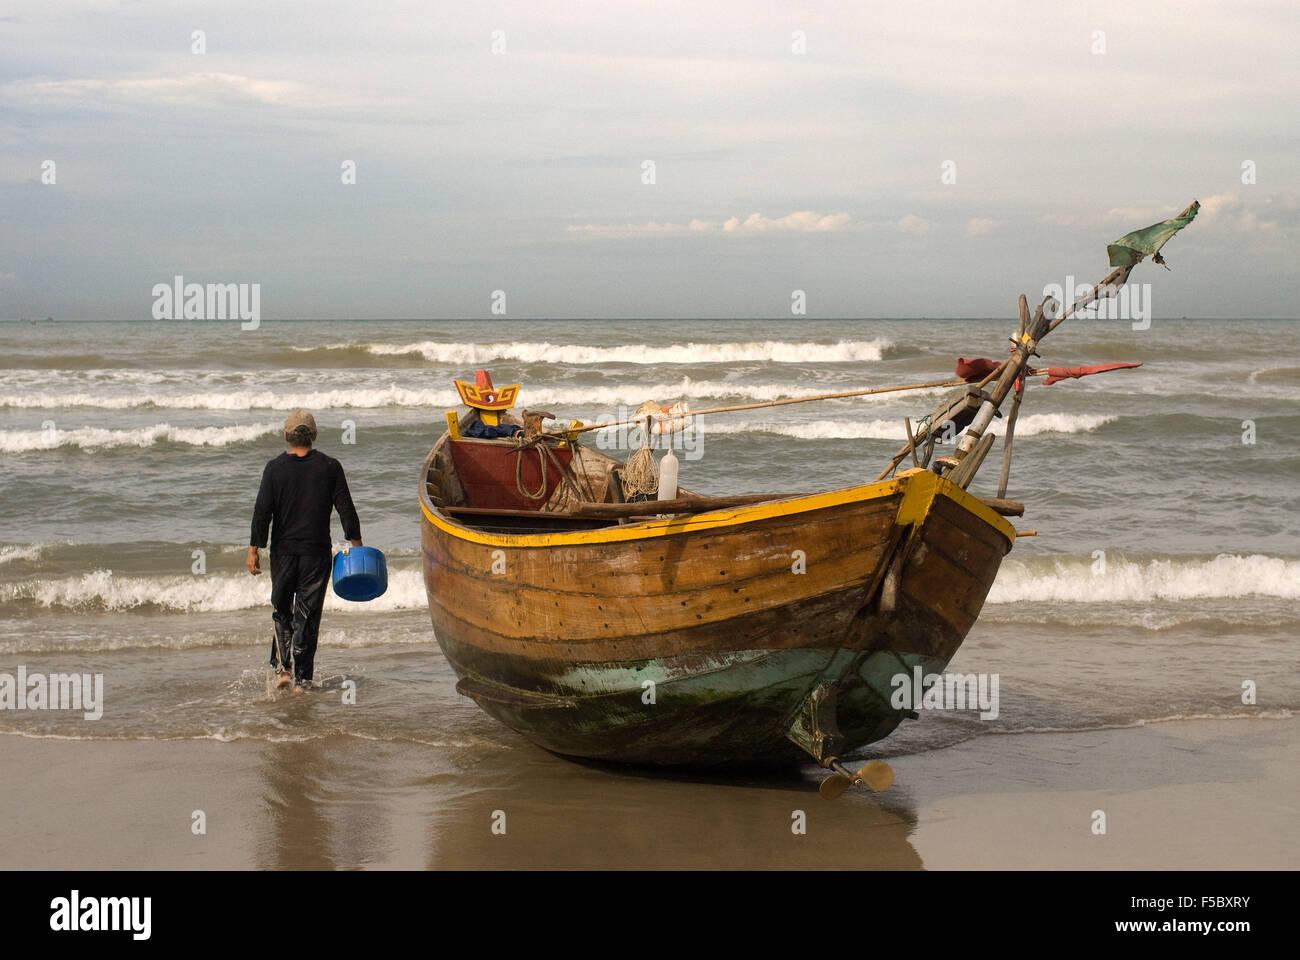 Vietnam, Mui Ne, Mui Ne Beach, Fishing Catch. fishing village, Bình Thuận Province, Vietnam. - Stock Image